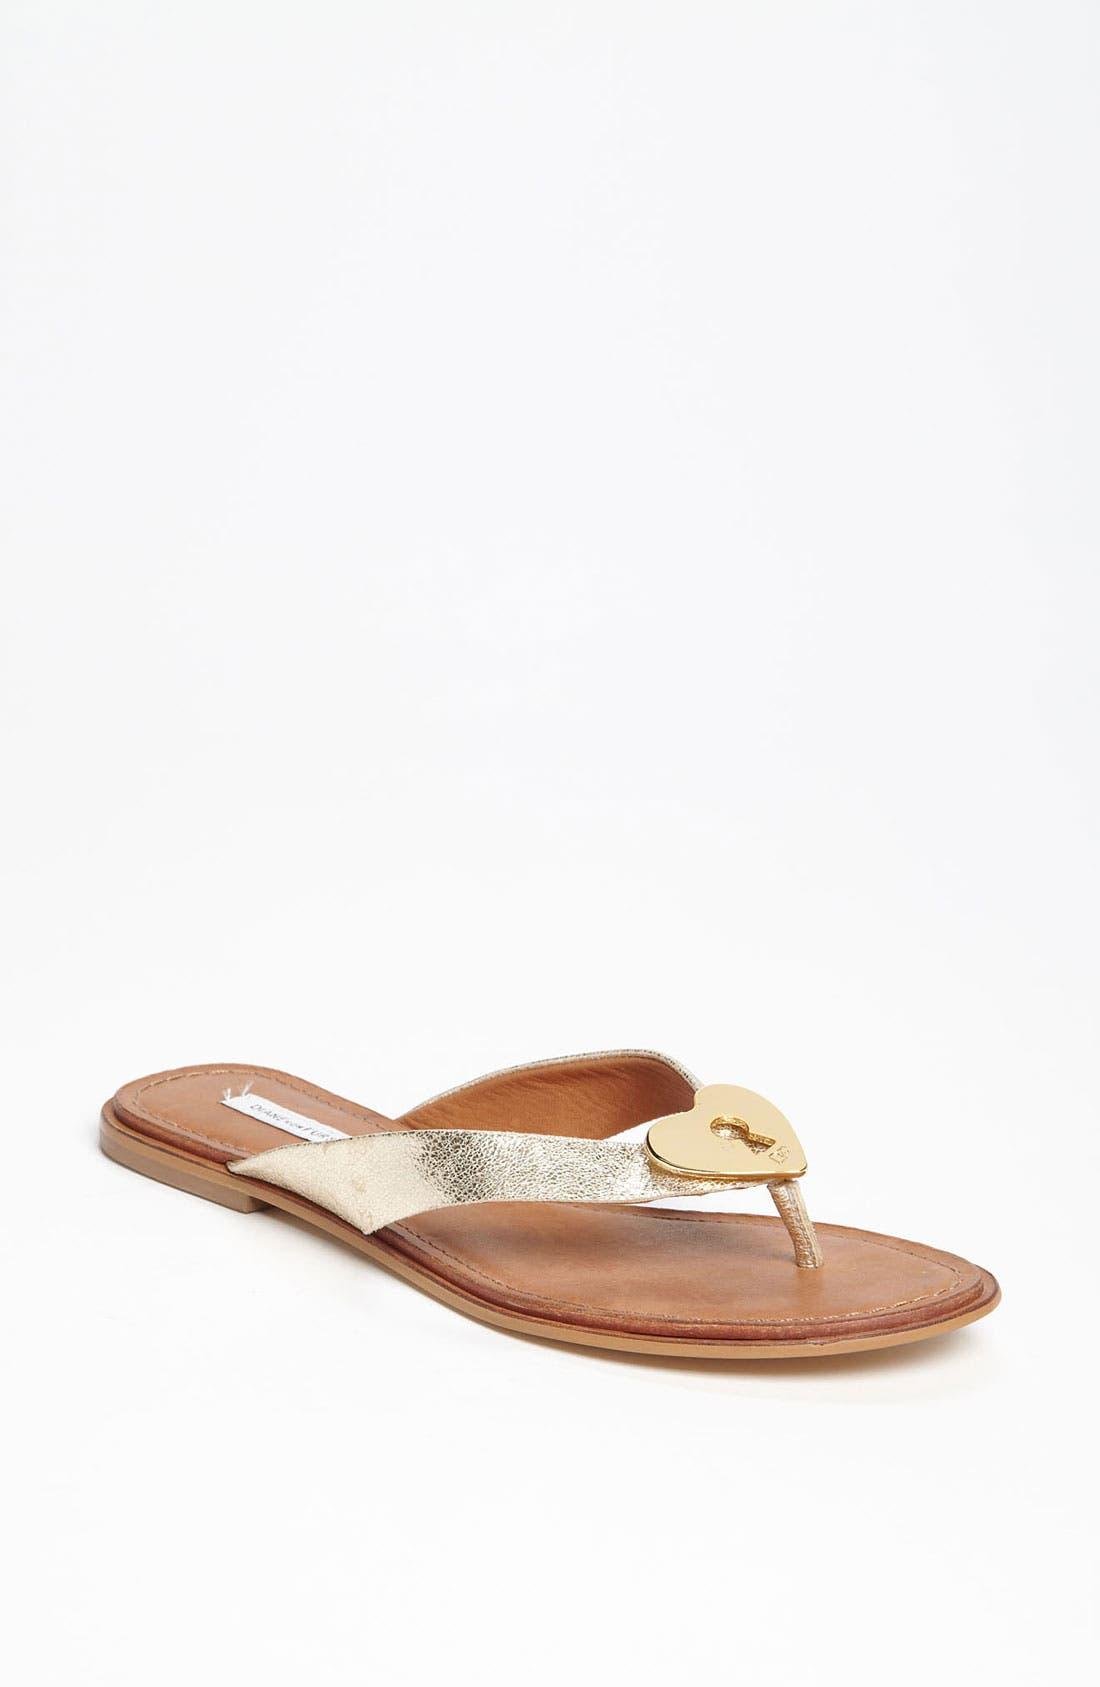 Alternate Image 1 Selected - Diane von Furstenberg 'Kyra' Sandal